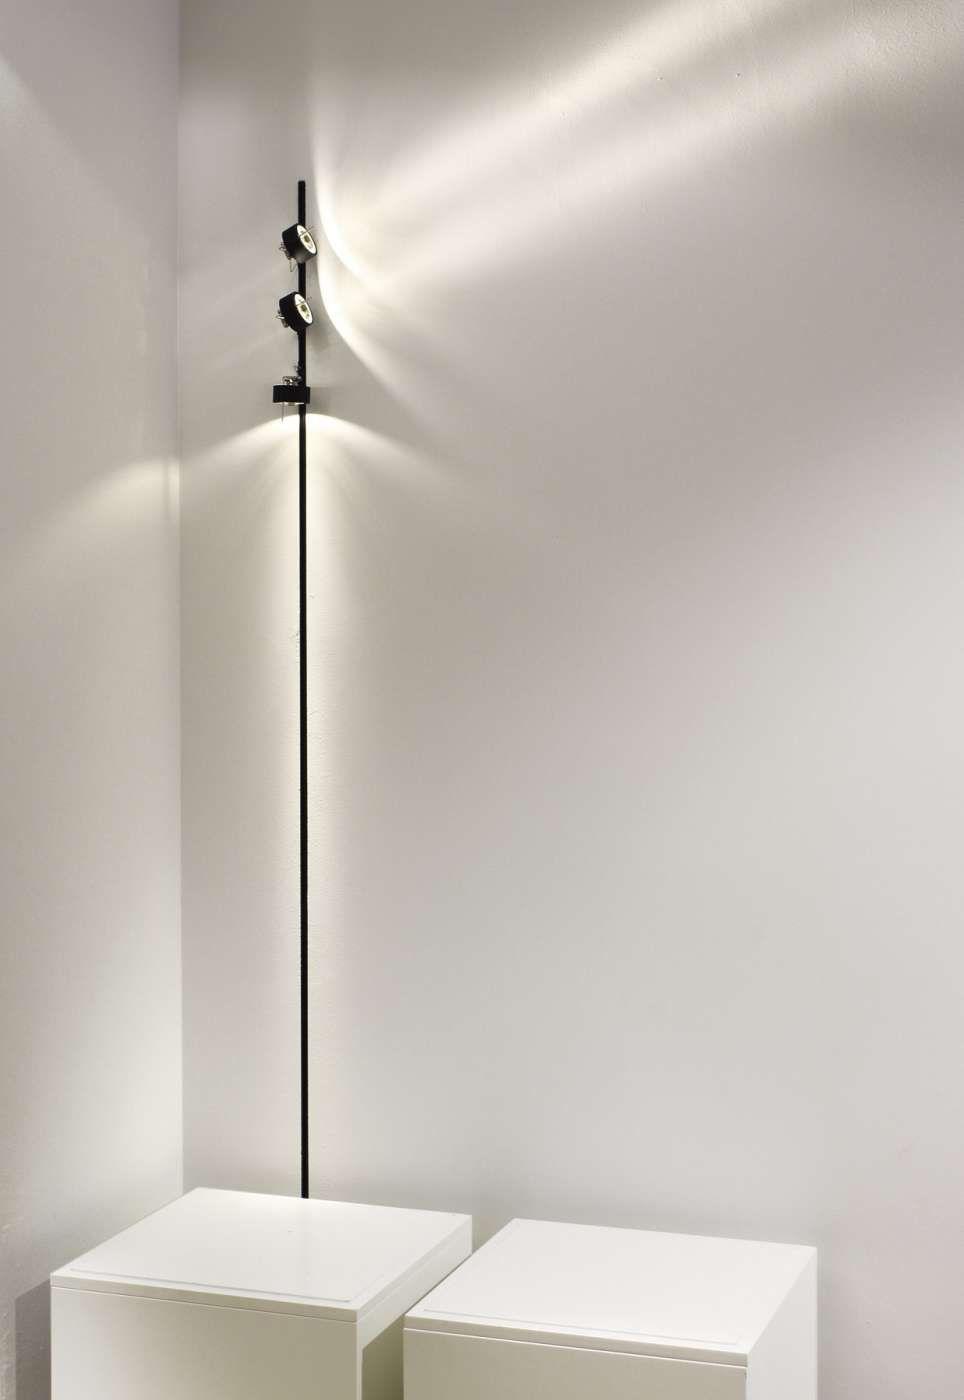 Vertical track new digs pinterest lights lighting design and vertical track aloadofball Images